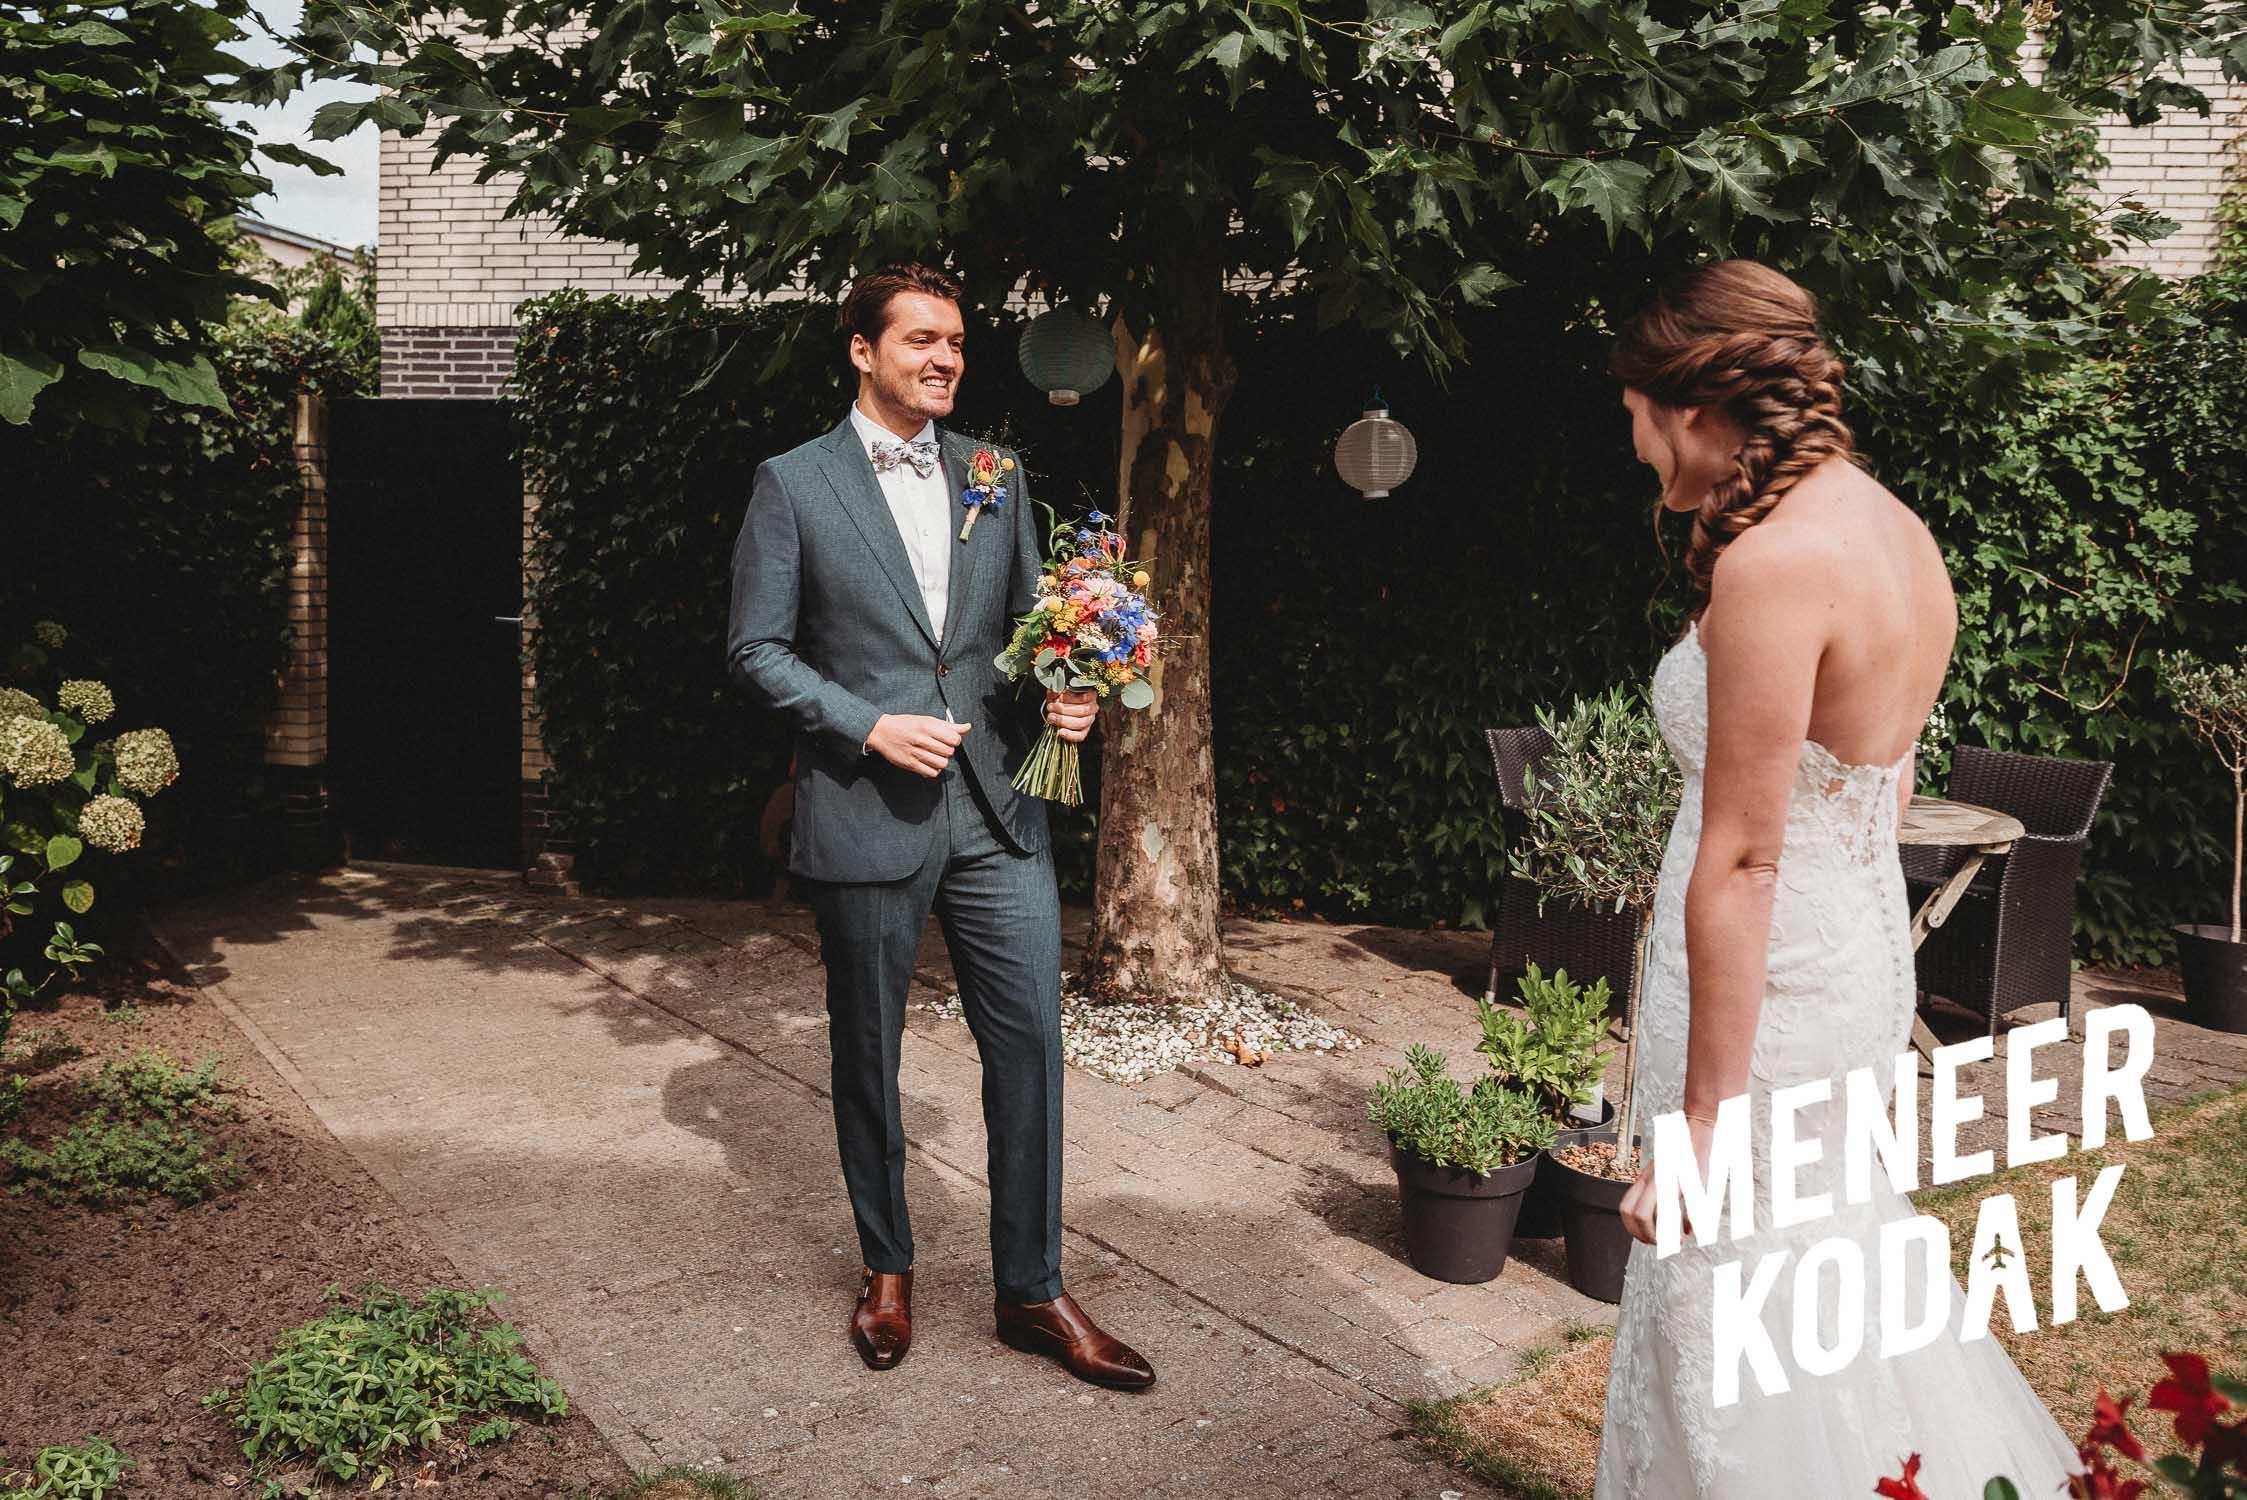 Meneer Kodak - Trouwreportage - Breda - E&M-070.jpg